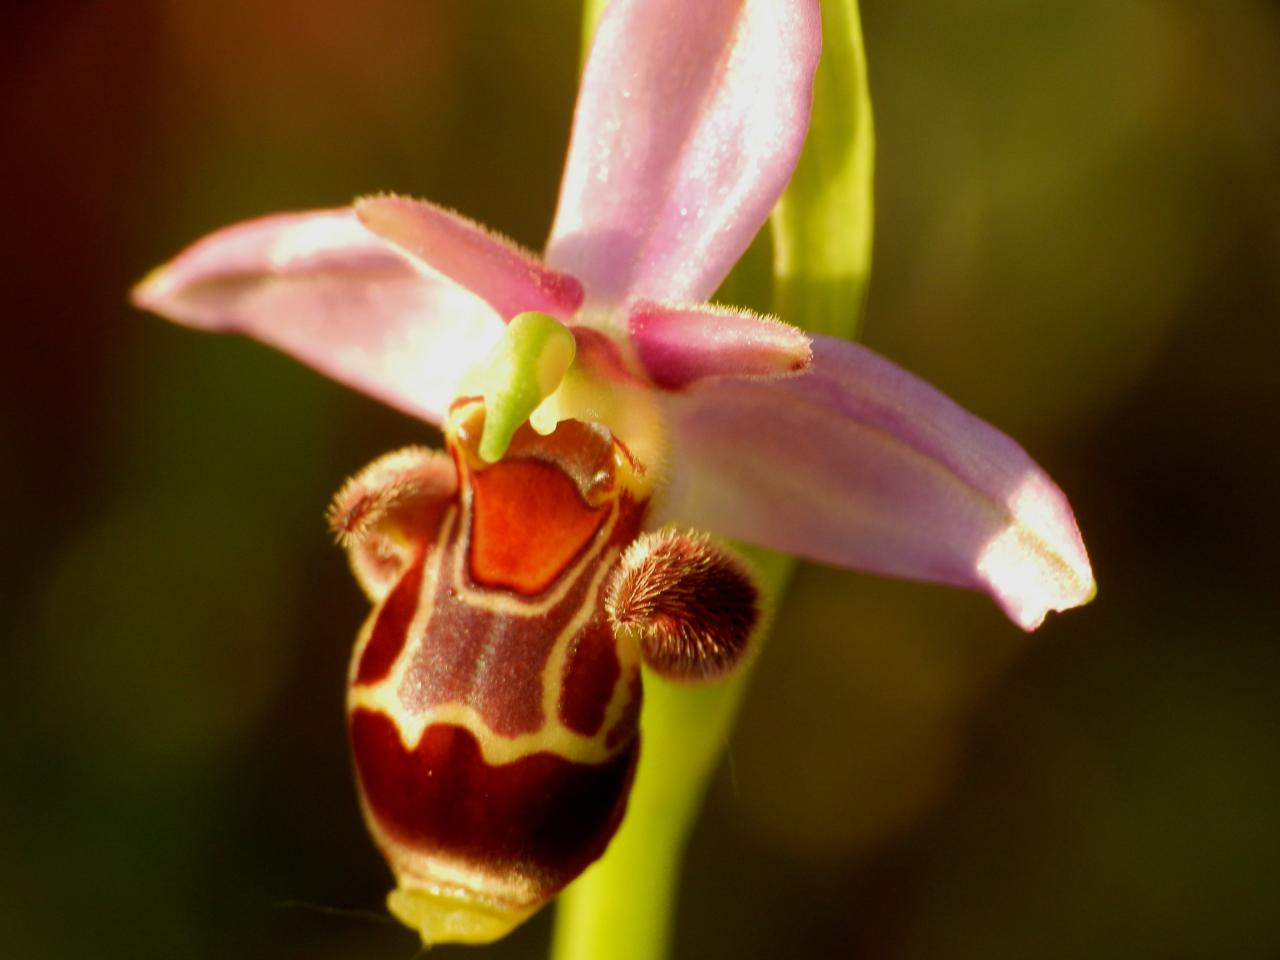 Ophrys scolopax, ophrys bécasse à Malras 11 (le 16 mai 2014)